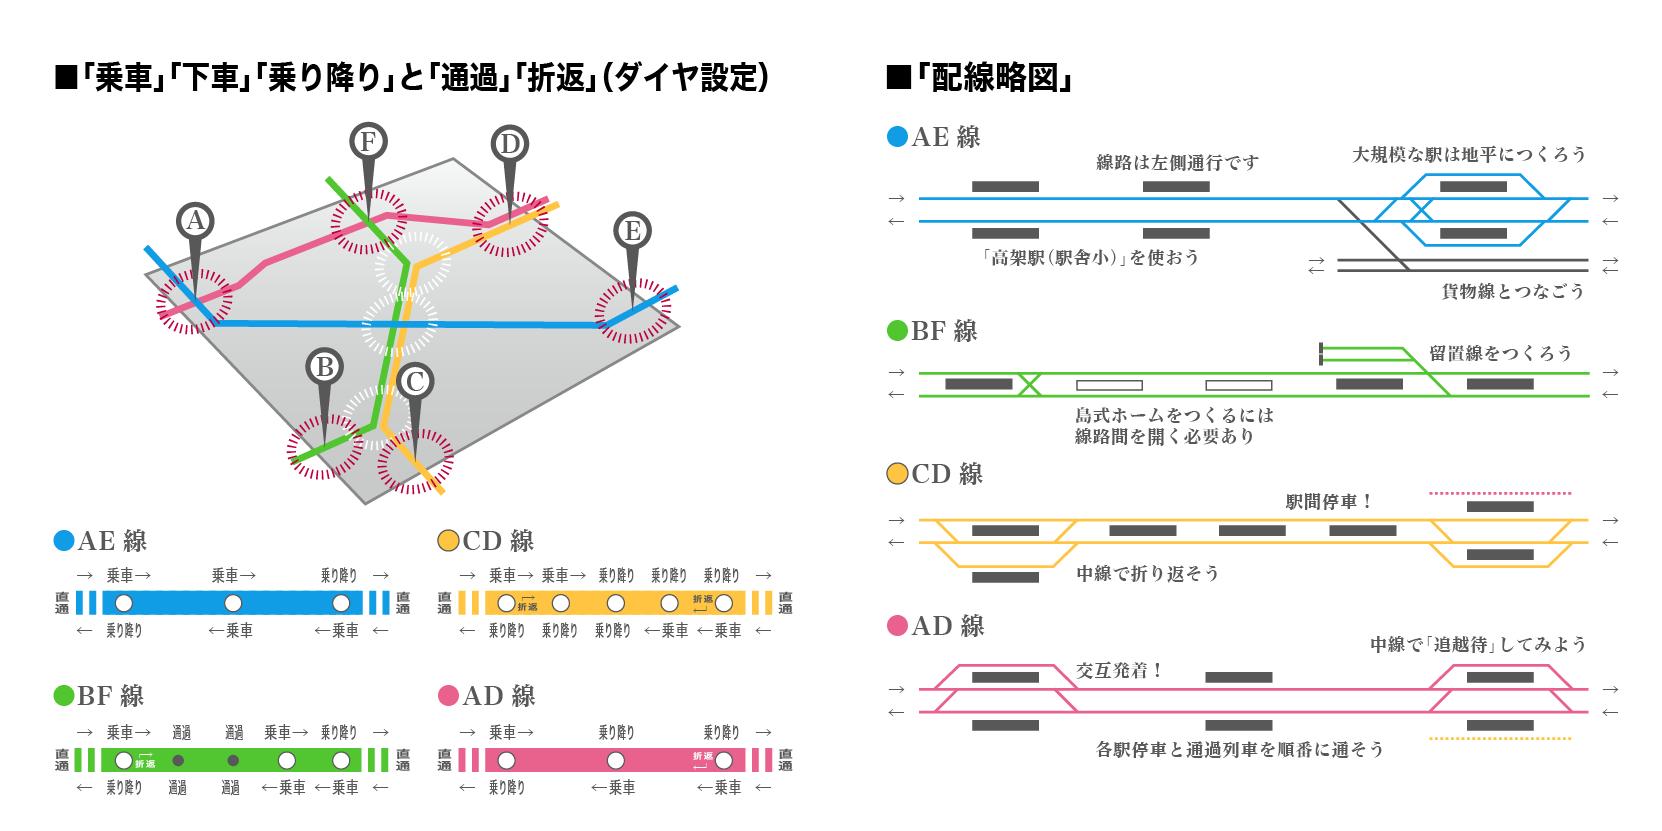 https://neorail.jp/forum/uploads/a9_basics_line02.png?ref=3862